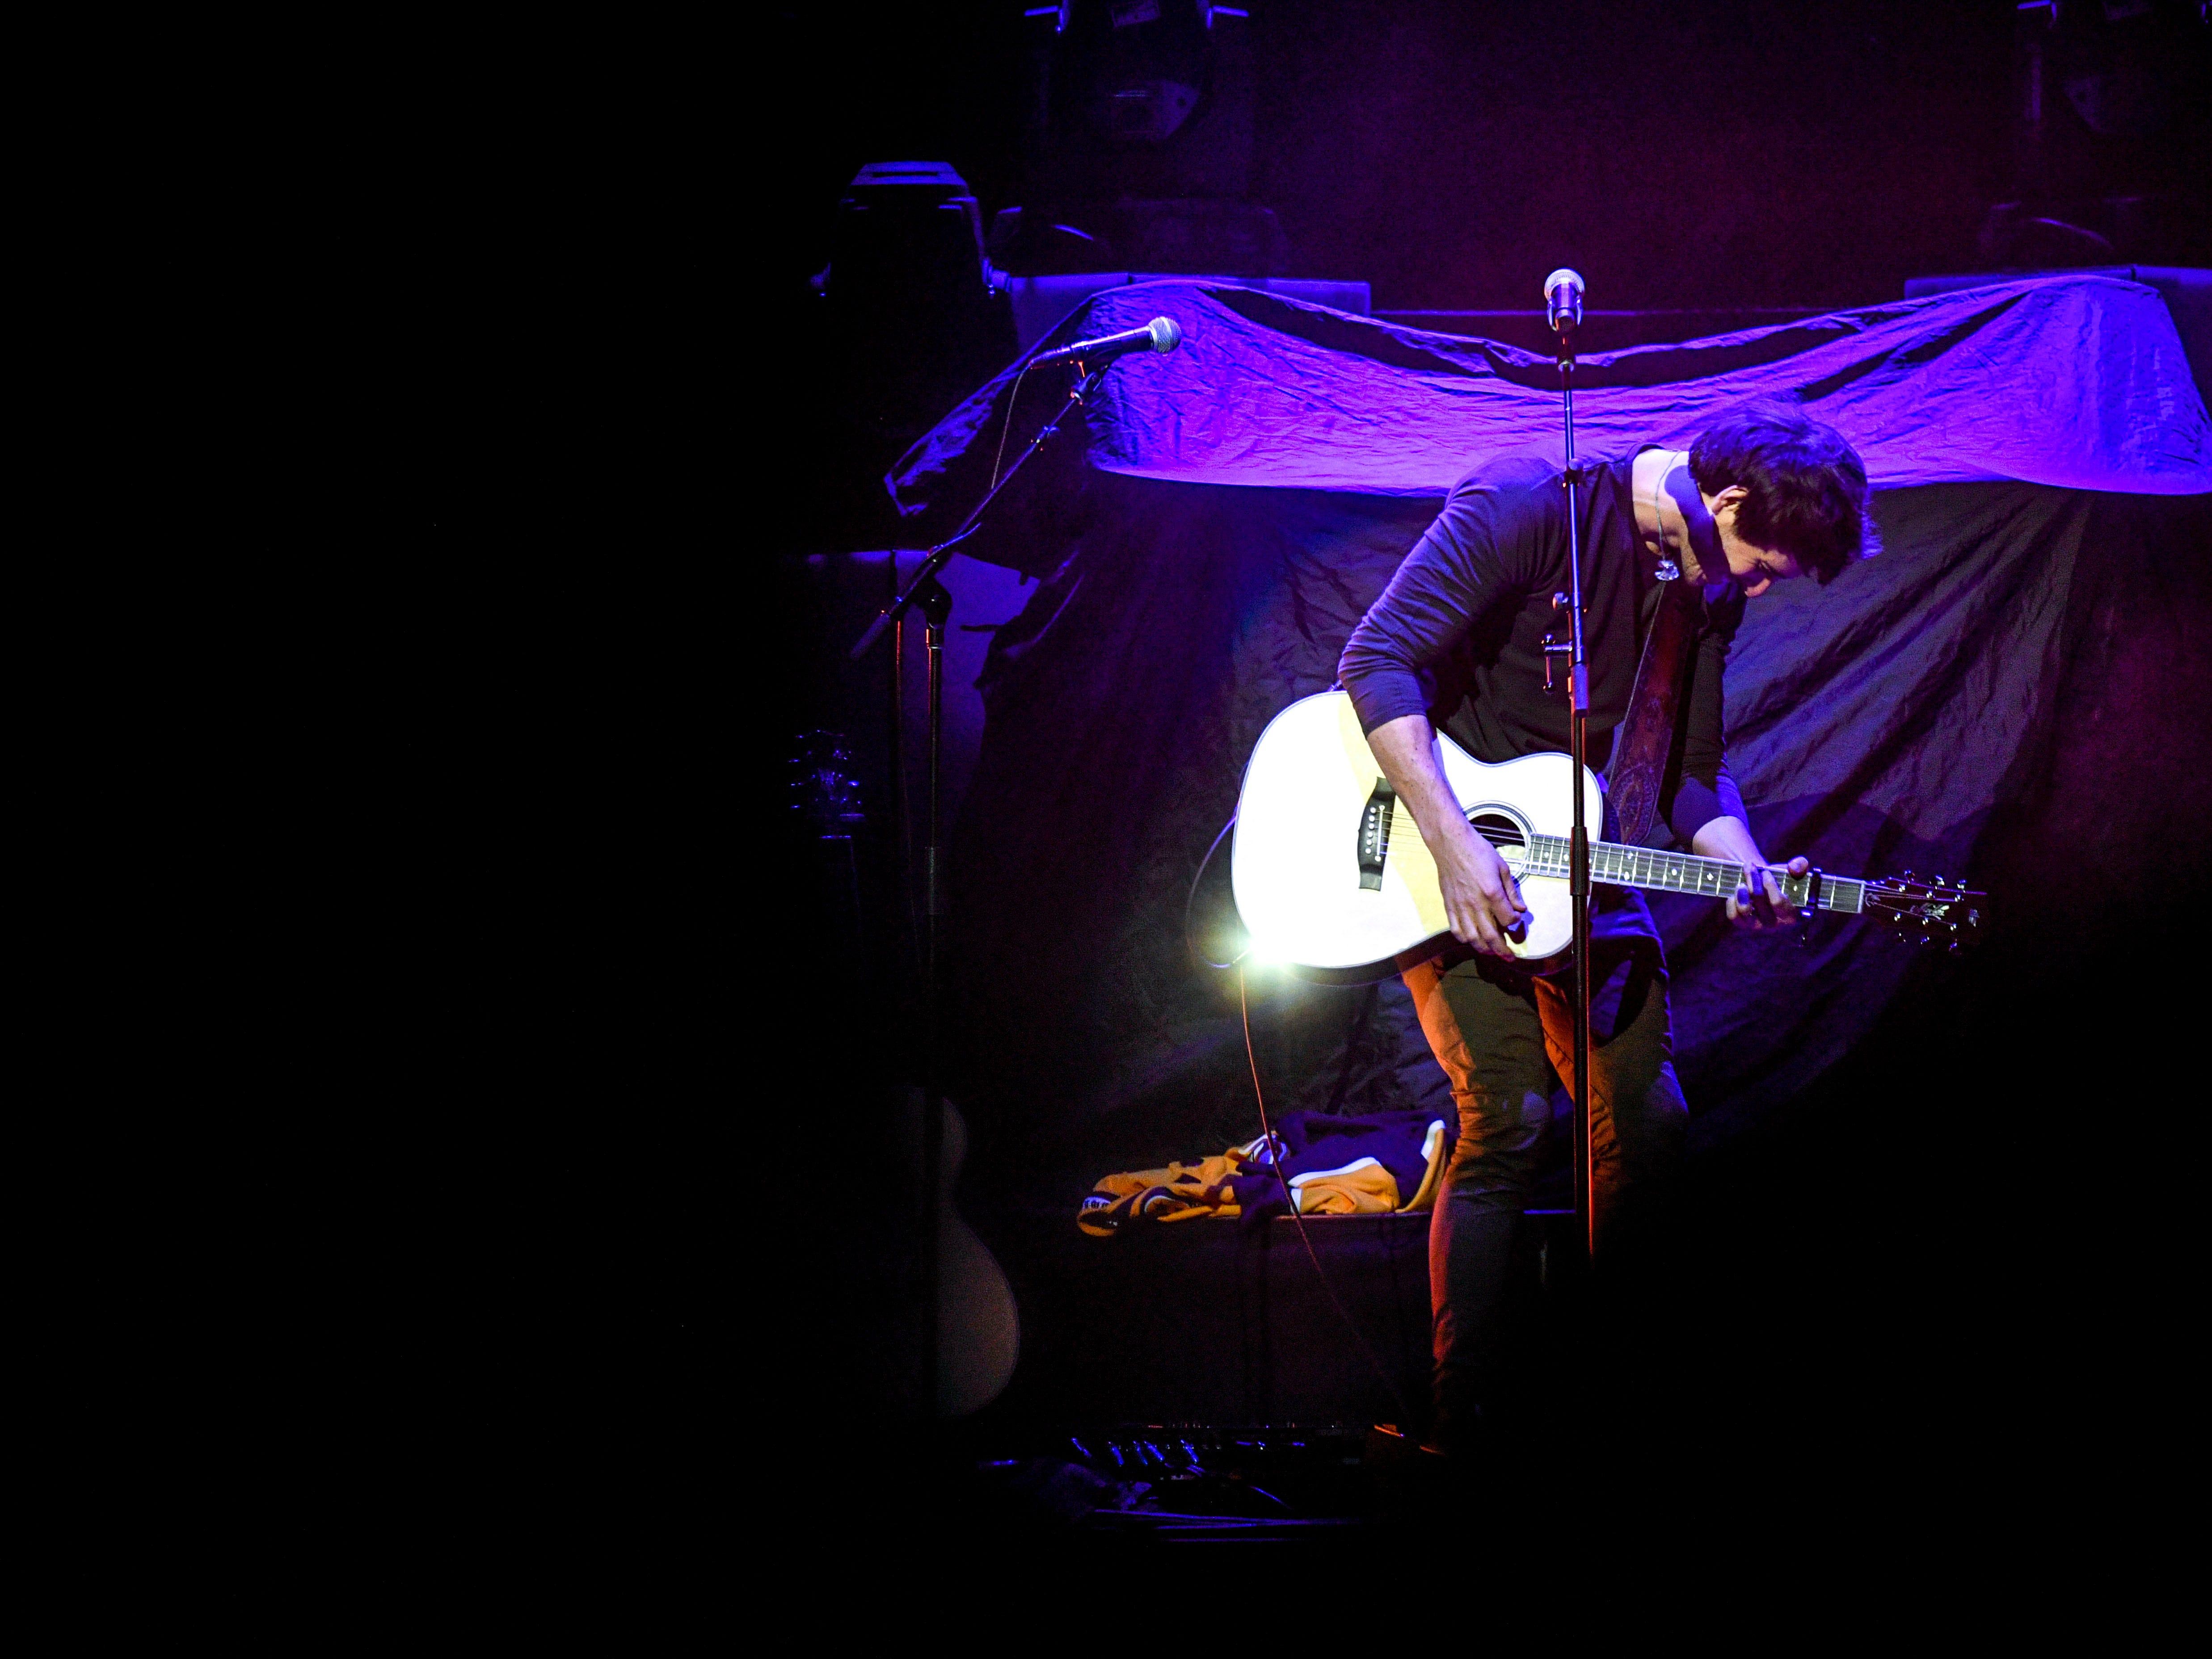 Morgan Evans performs as an opening act for Chris Young at Bridgestone Arena in Nashville, Tenn., Saturday, Sept. 22, 2018.